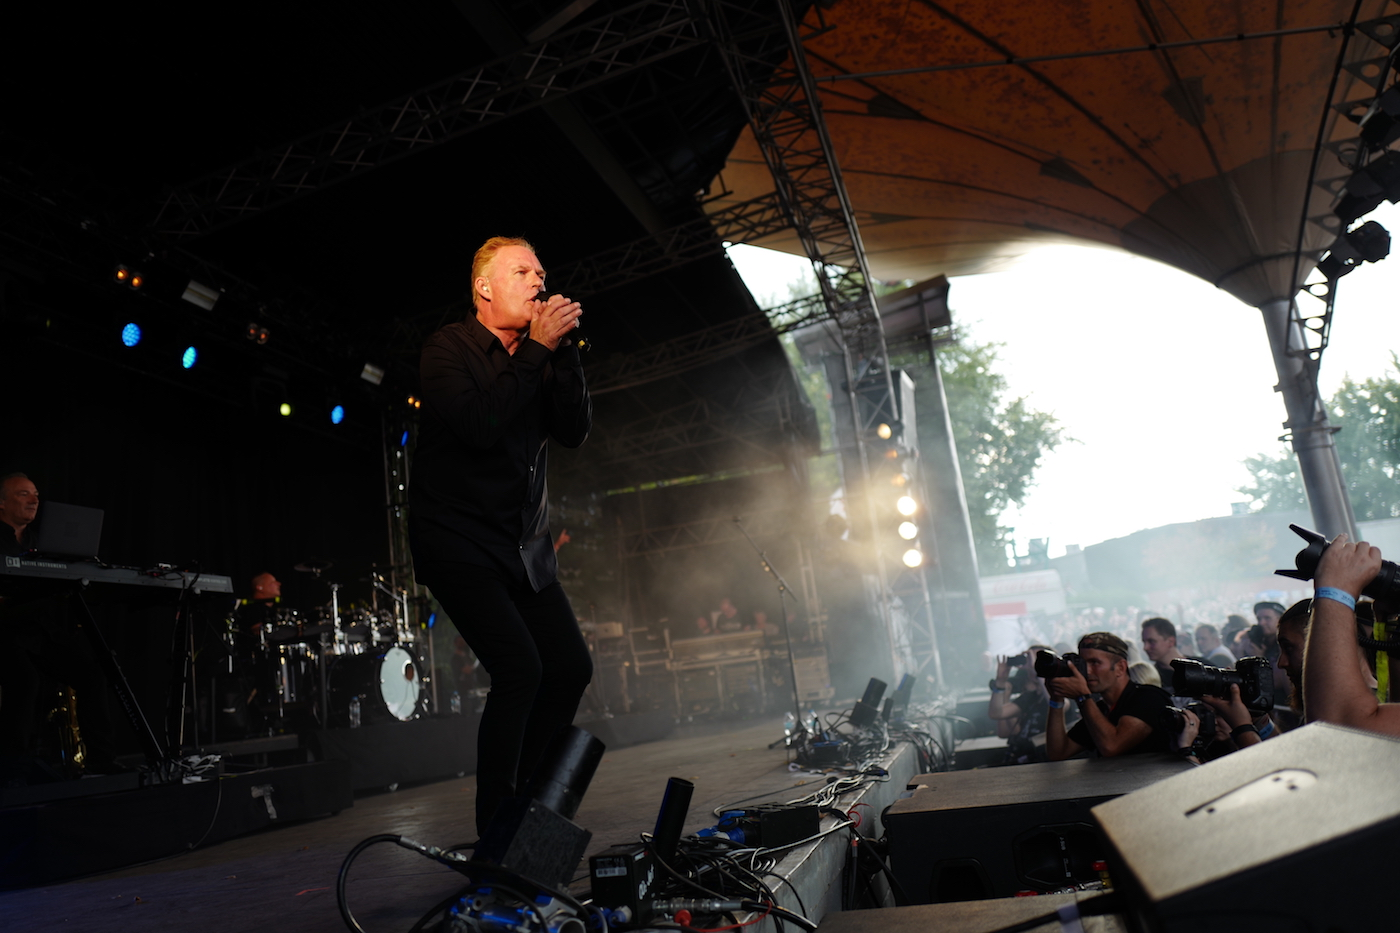 mark_benecke_amphi_festival_koeln_cologne_tanzbrunnen_gothic_OMD_oomph_agonoize_mono_inc_es23_sitd_solar_fake - 73.jpg